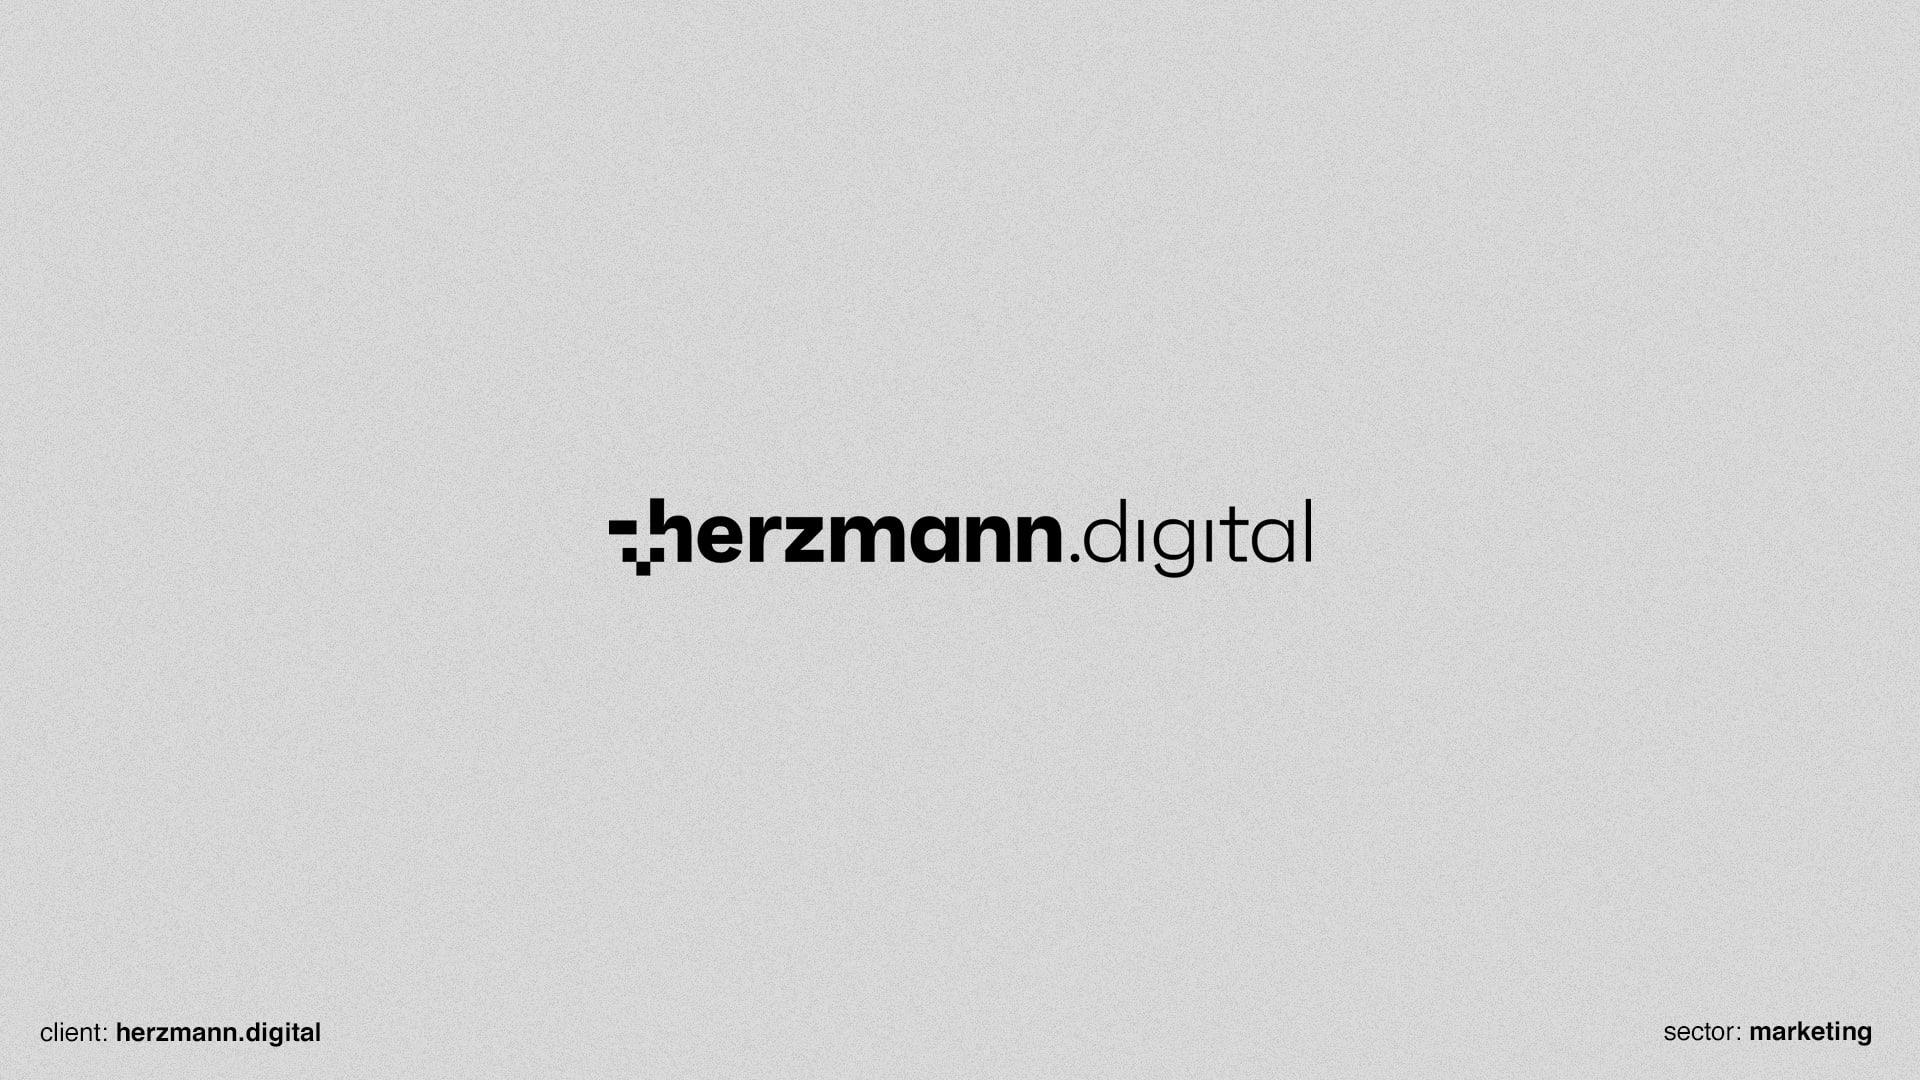 013-herzmann